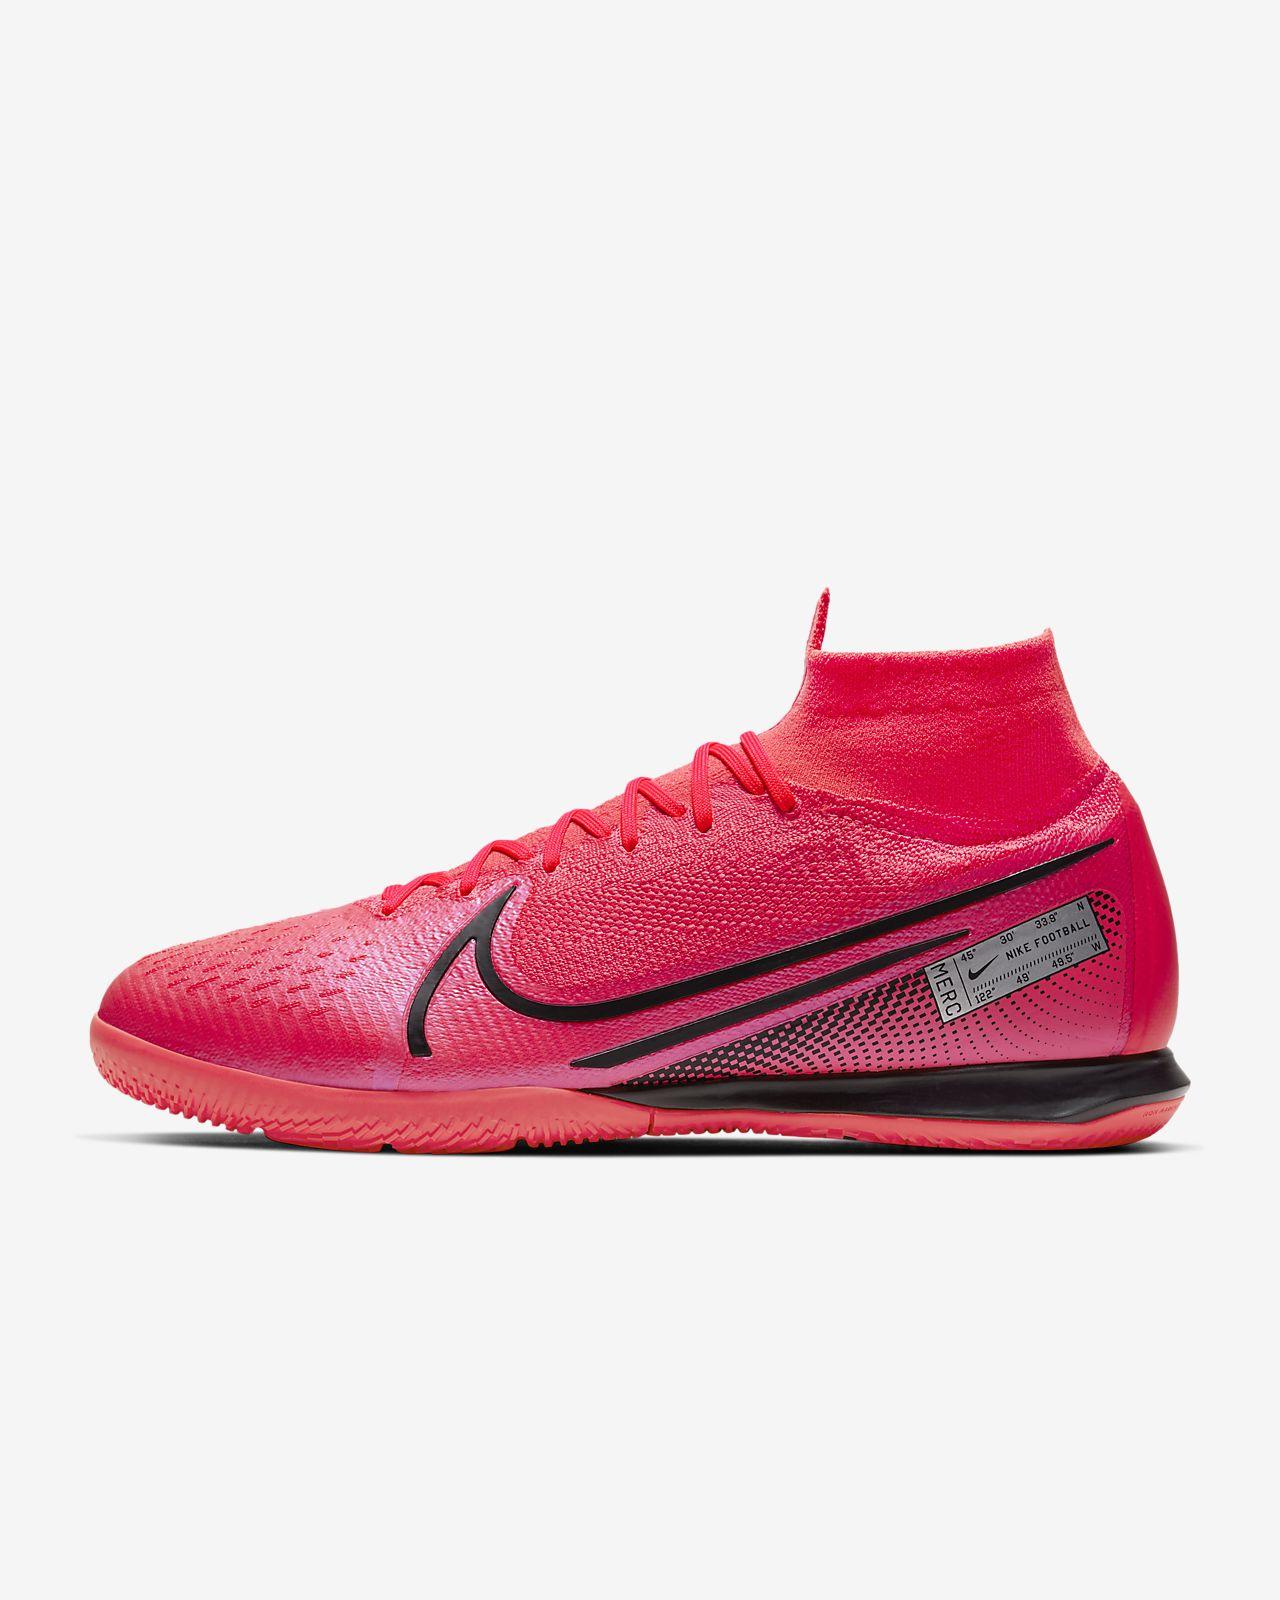 Scarpa da calcio per campi indoorcemento Nike Mercurial Superfly 7 Elite IC